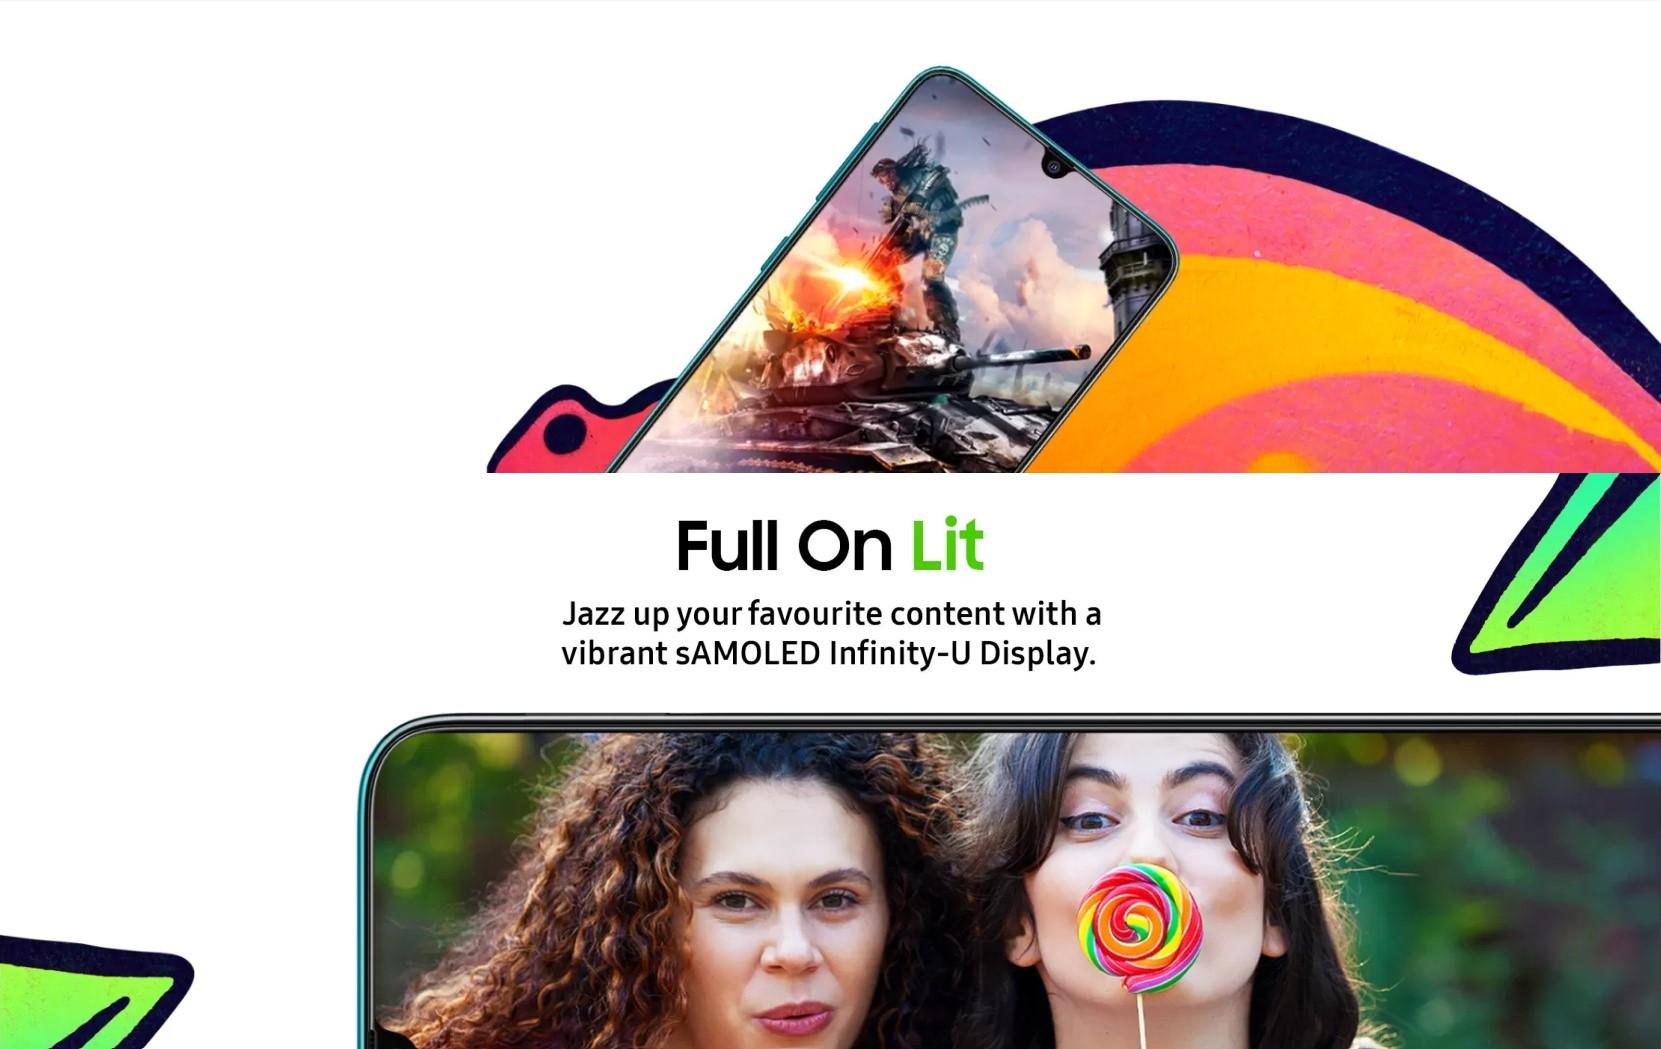 Samsung Galaxy F41 Super AMOLED Infinity-U Display